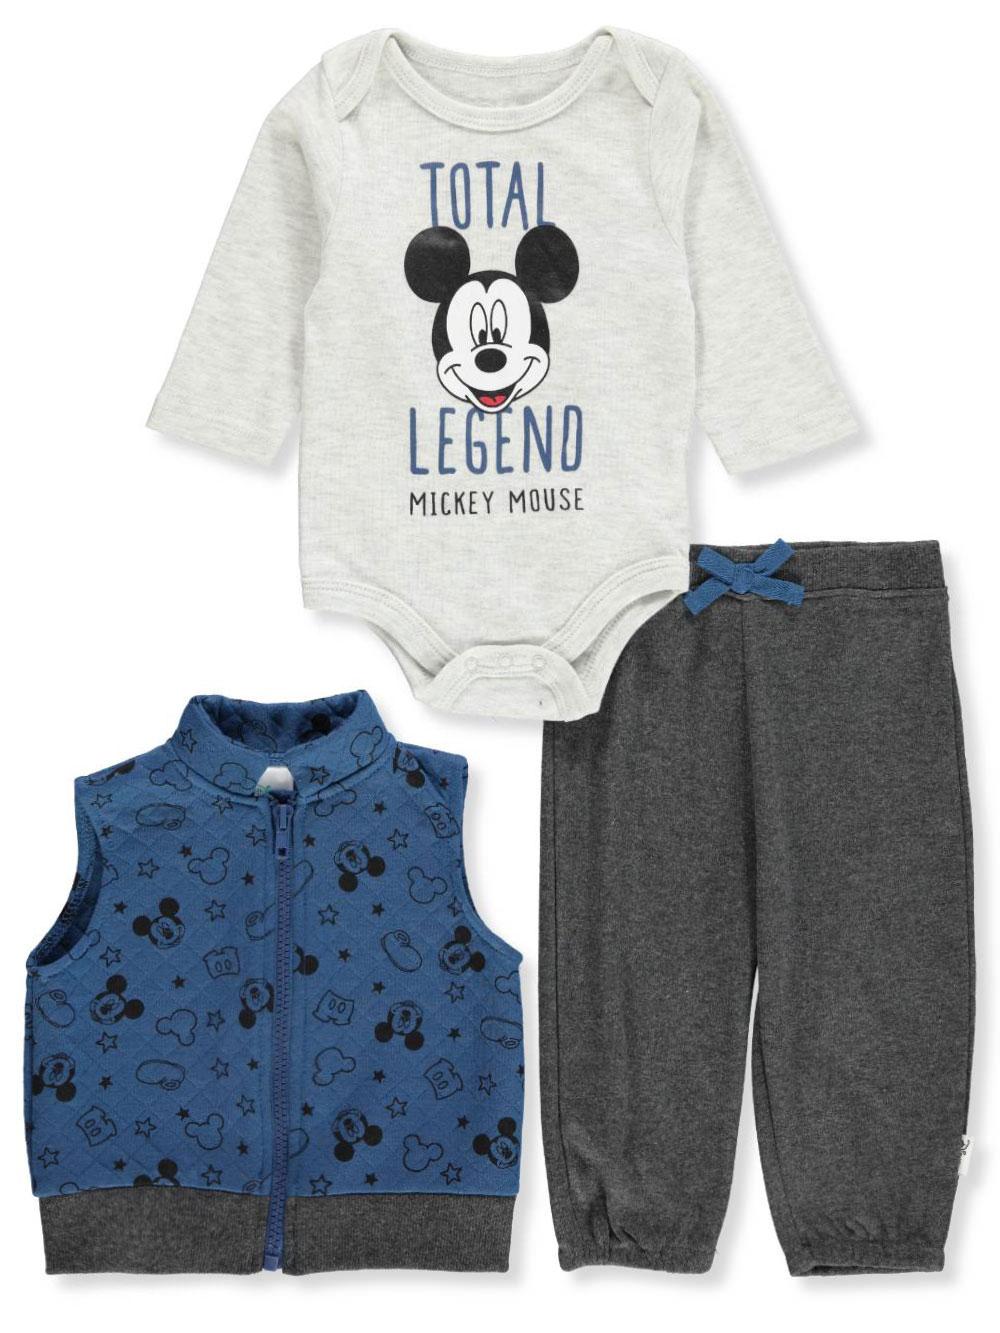 Disney Mickey Mouse Baby Boys  3-Piece Pants Set Outfit  b2e841004